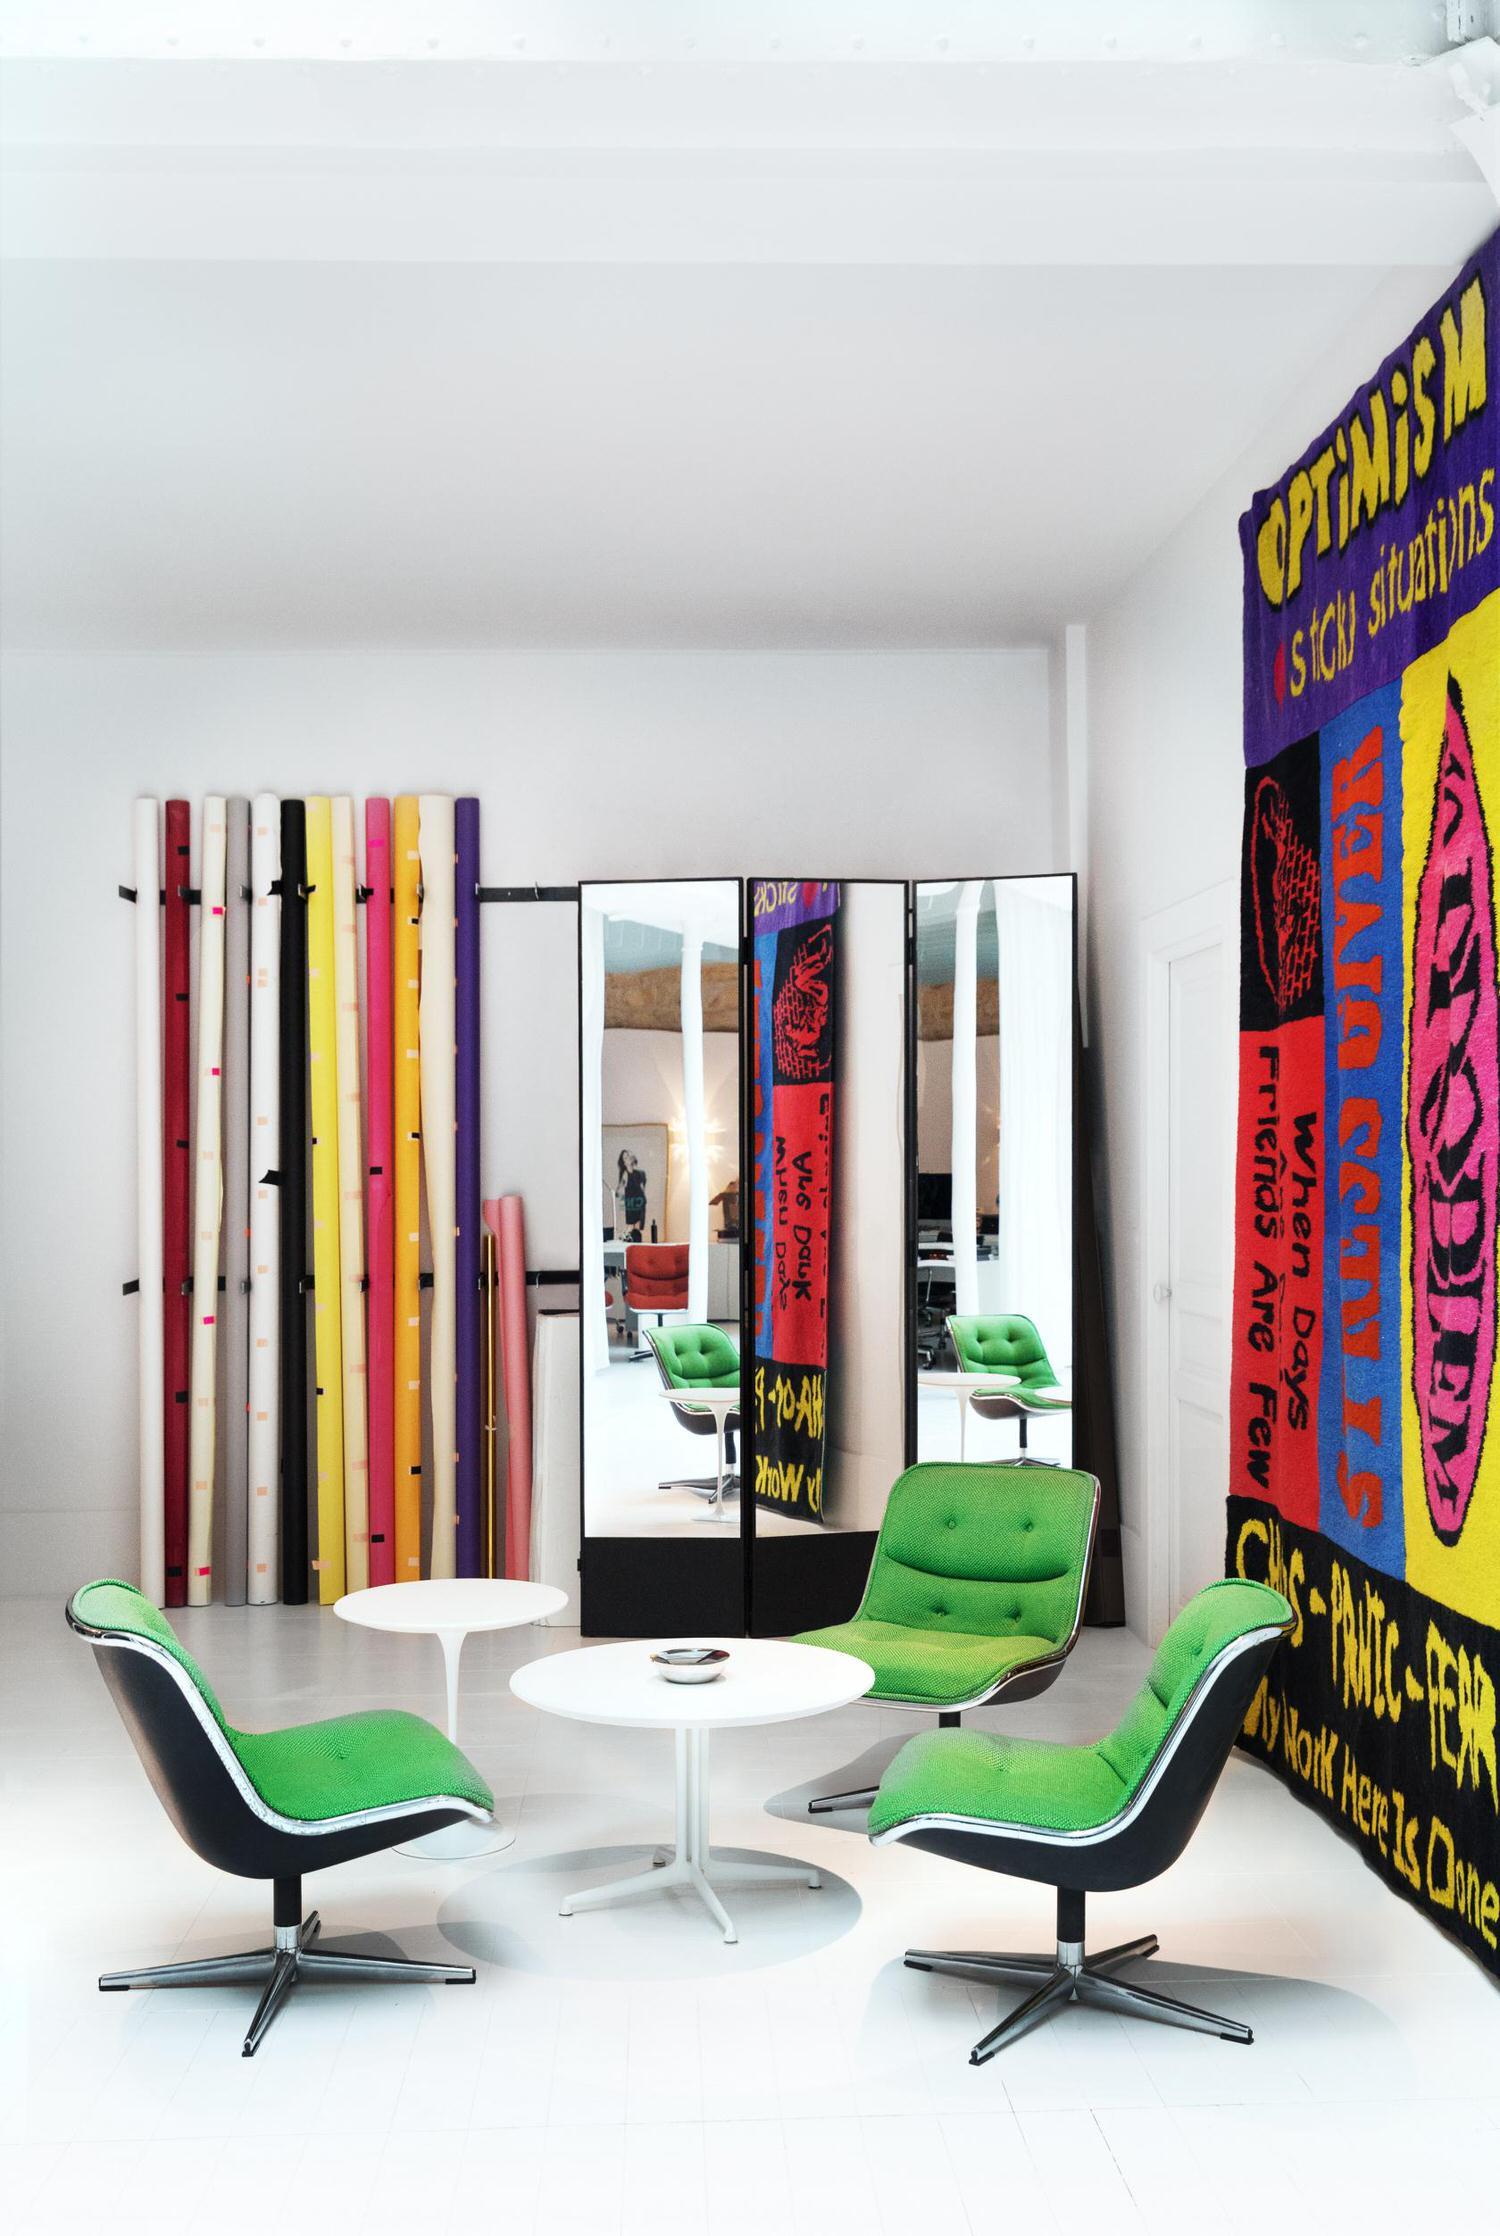 Al Dente Creative Agency Paris Hq Photo Roberta Valerio Yellowtrace 09